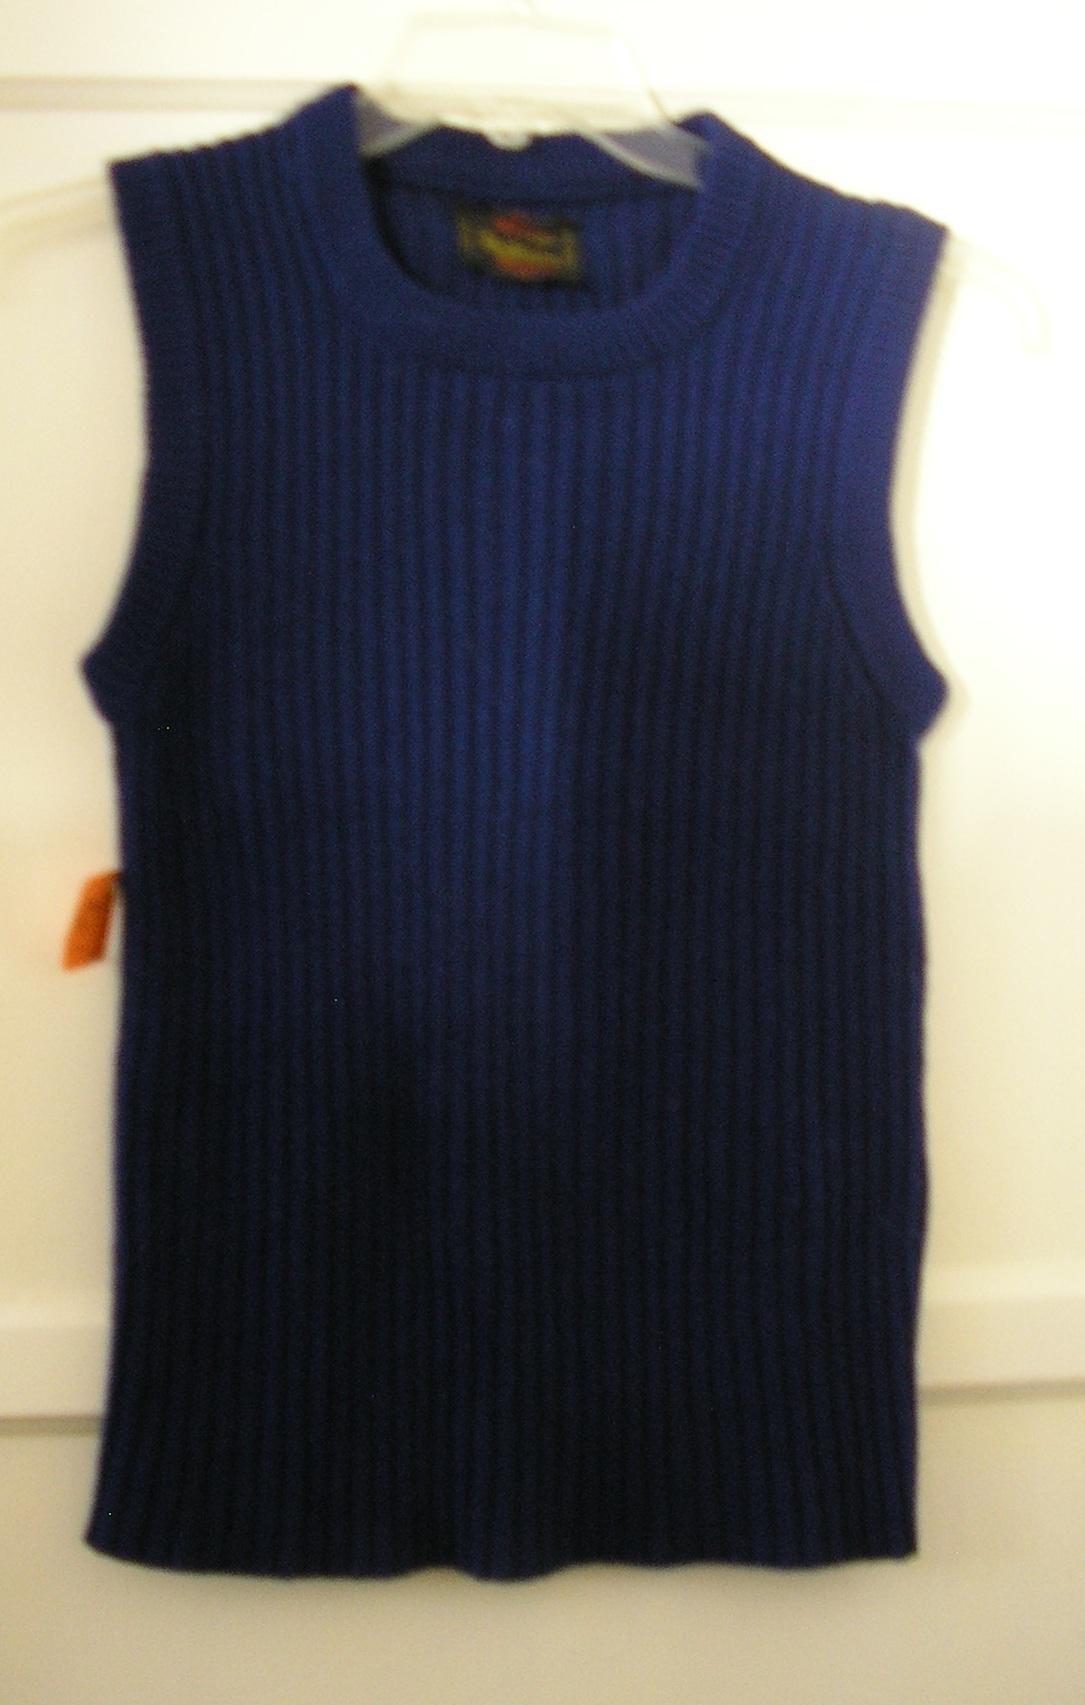 1970s groovy navy blue ribbed sweater vest size sm